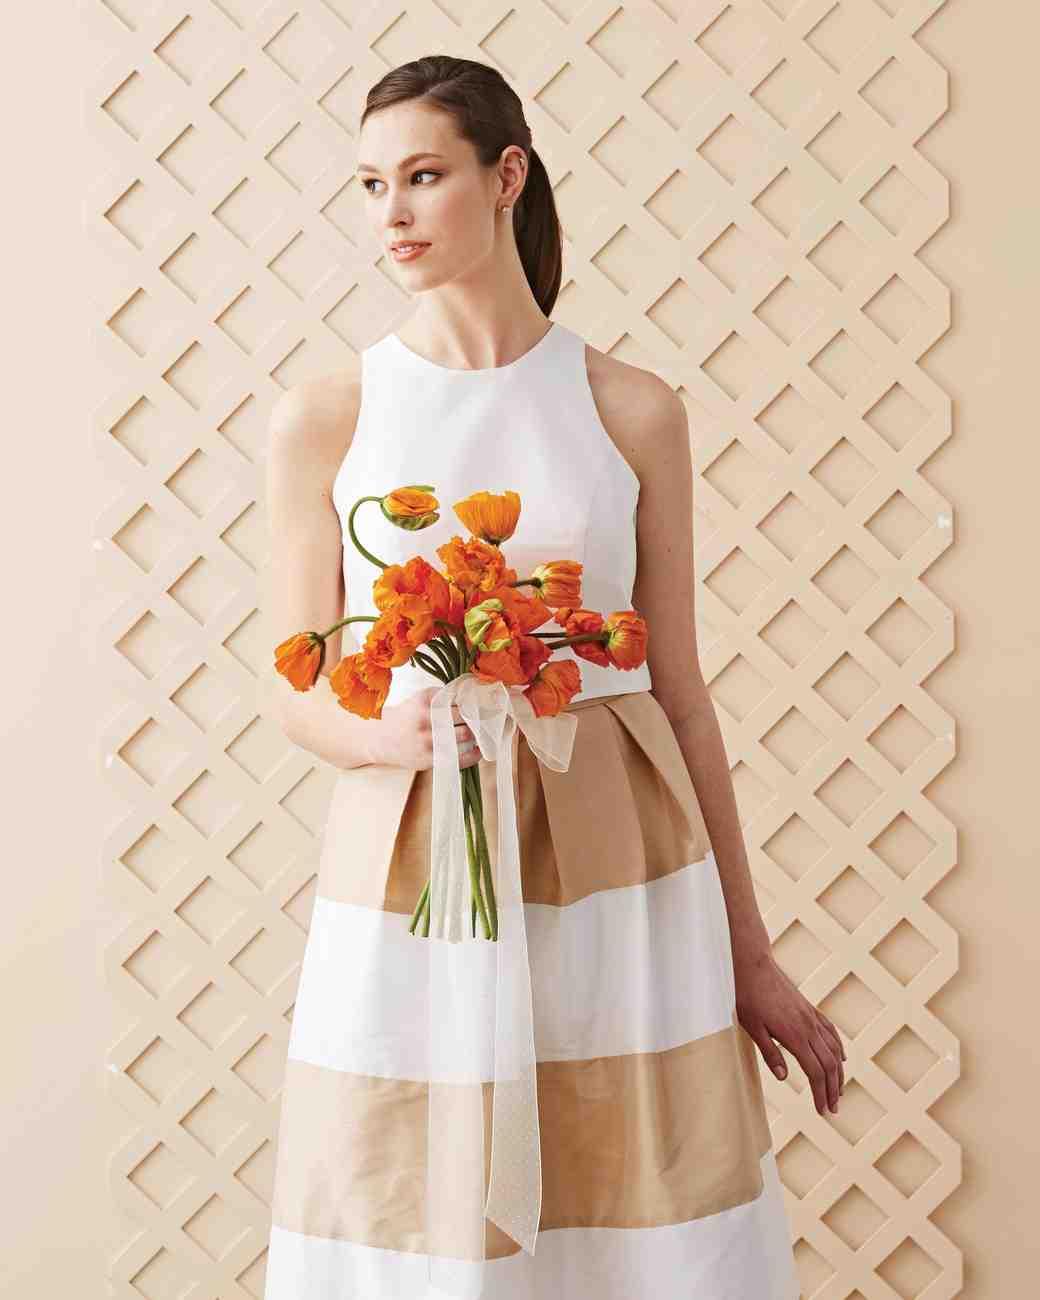 Bouquet of Orange Poppies